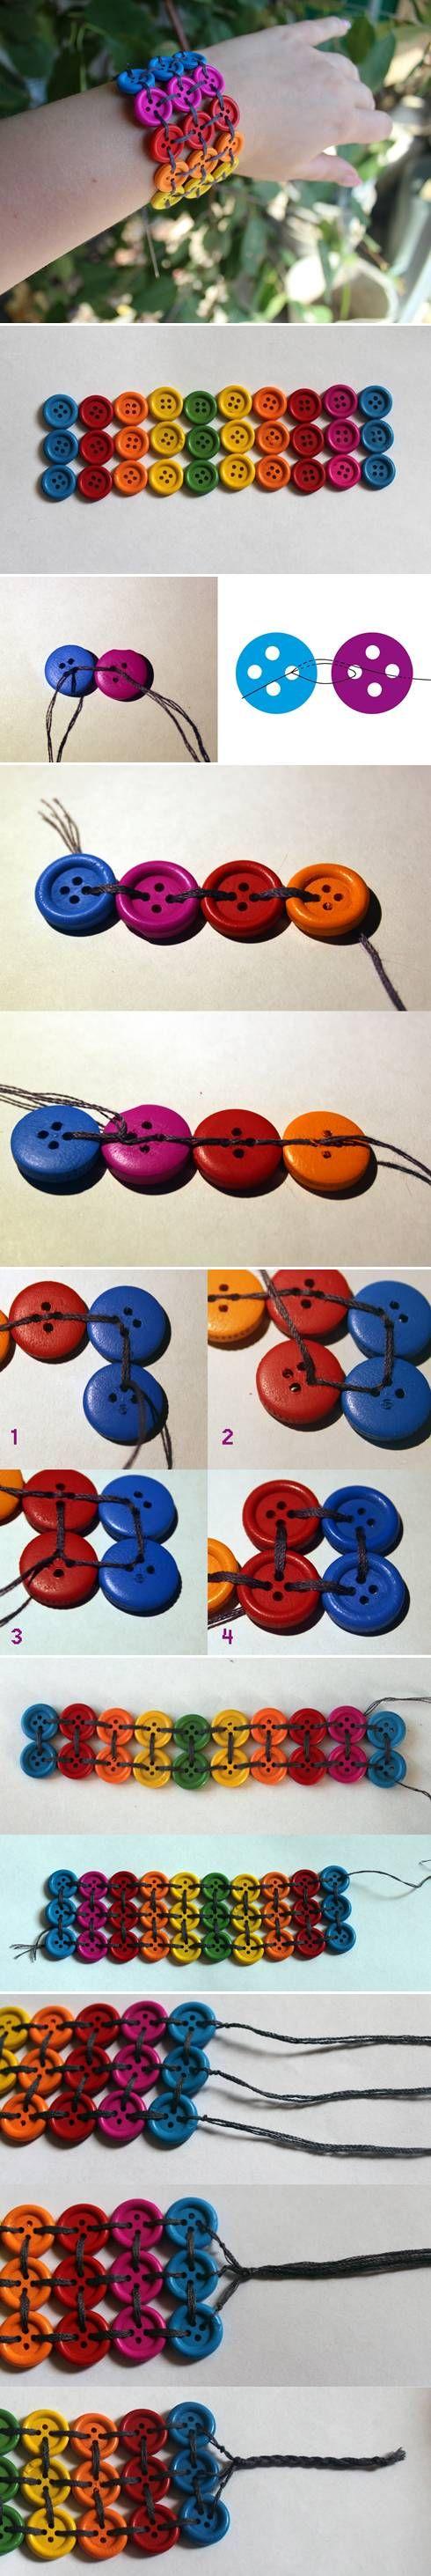 ideias para usar botoes 2